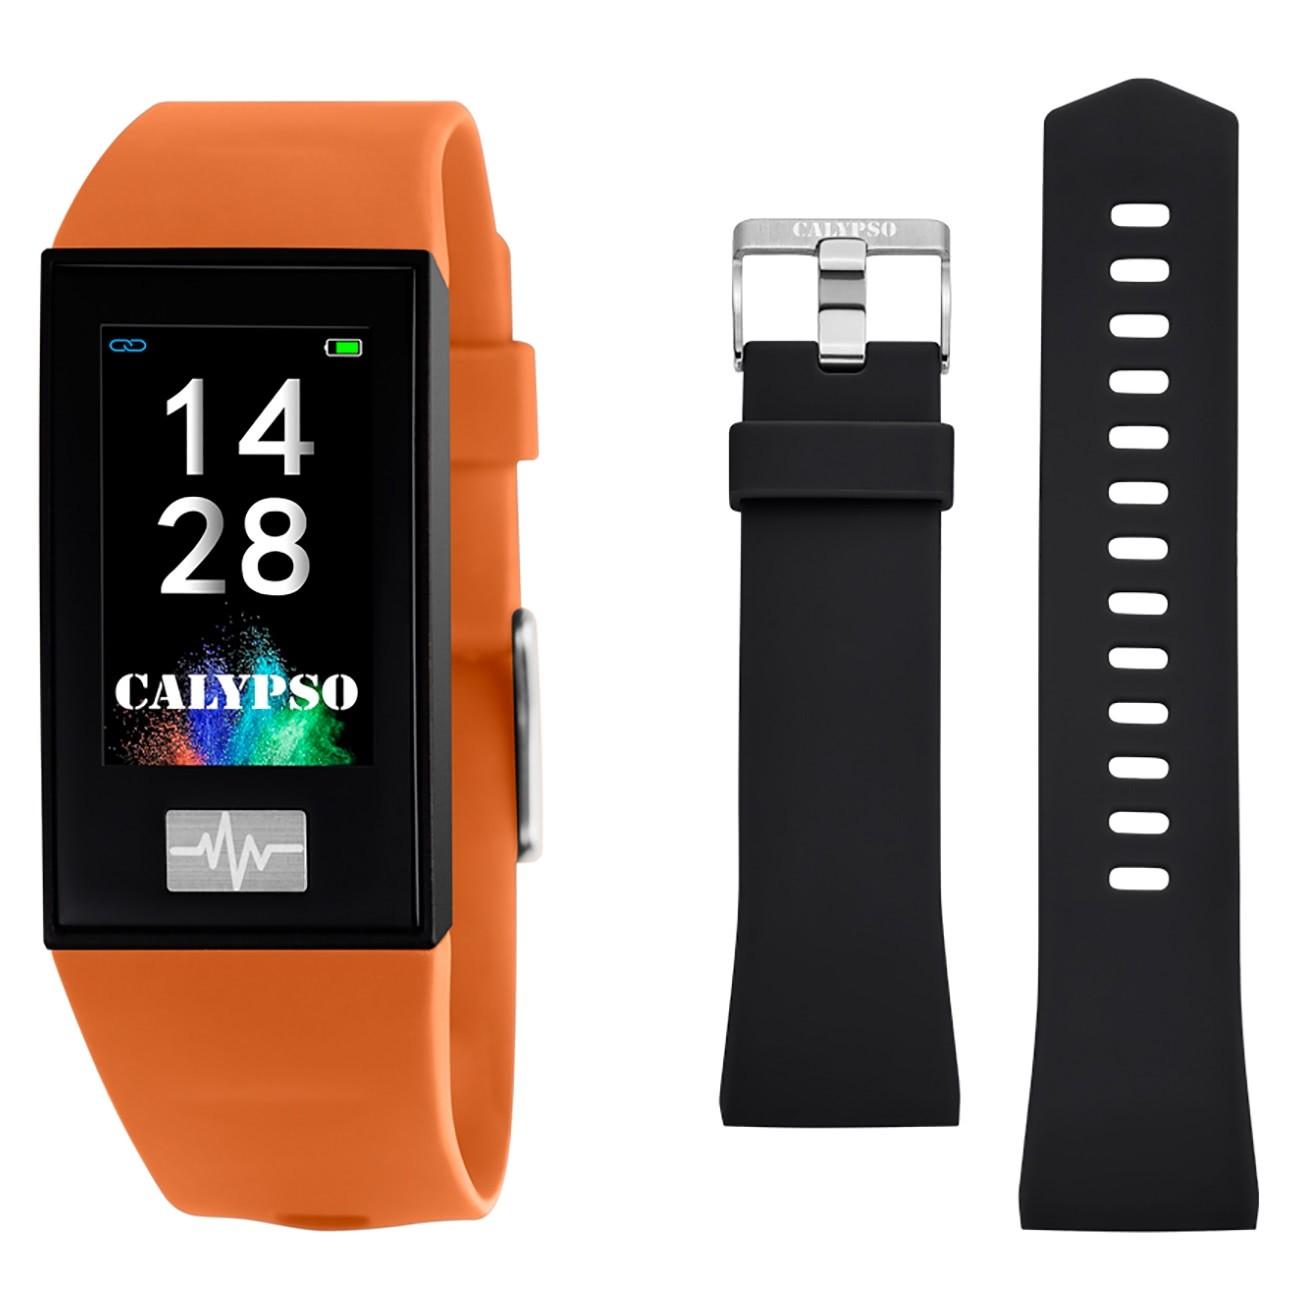 Calypso Fitness Tracker Smartime K8500-3 Smartwatch orange, schwarz TCK8500-3